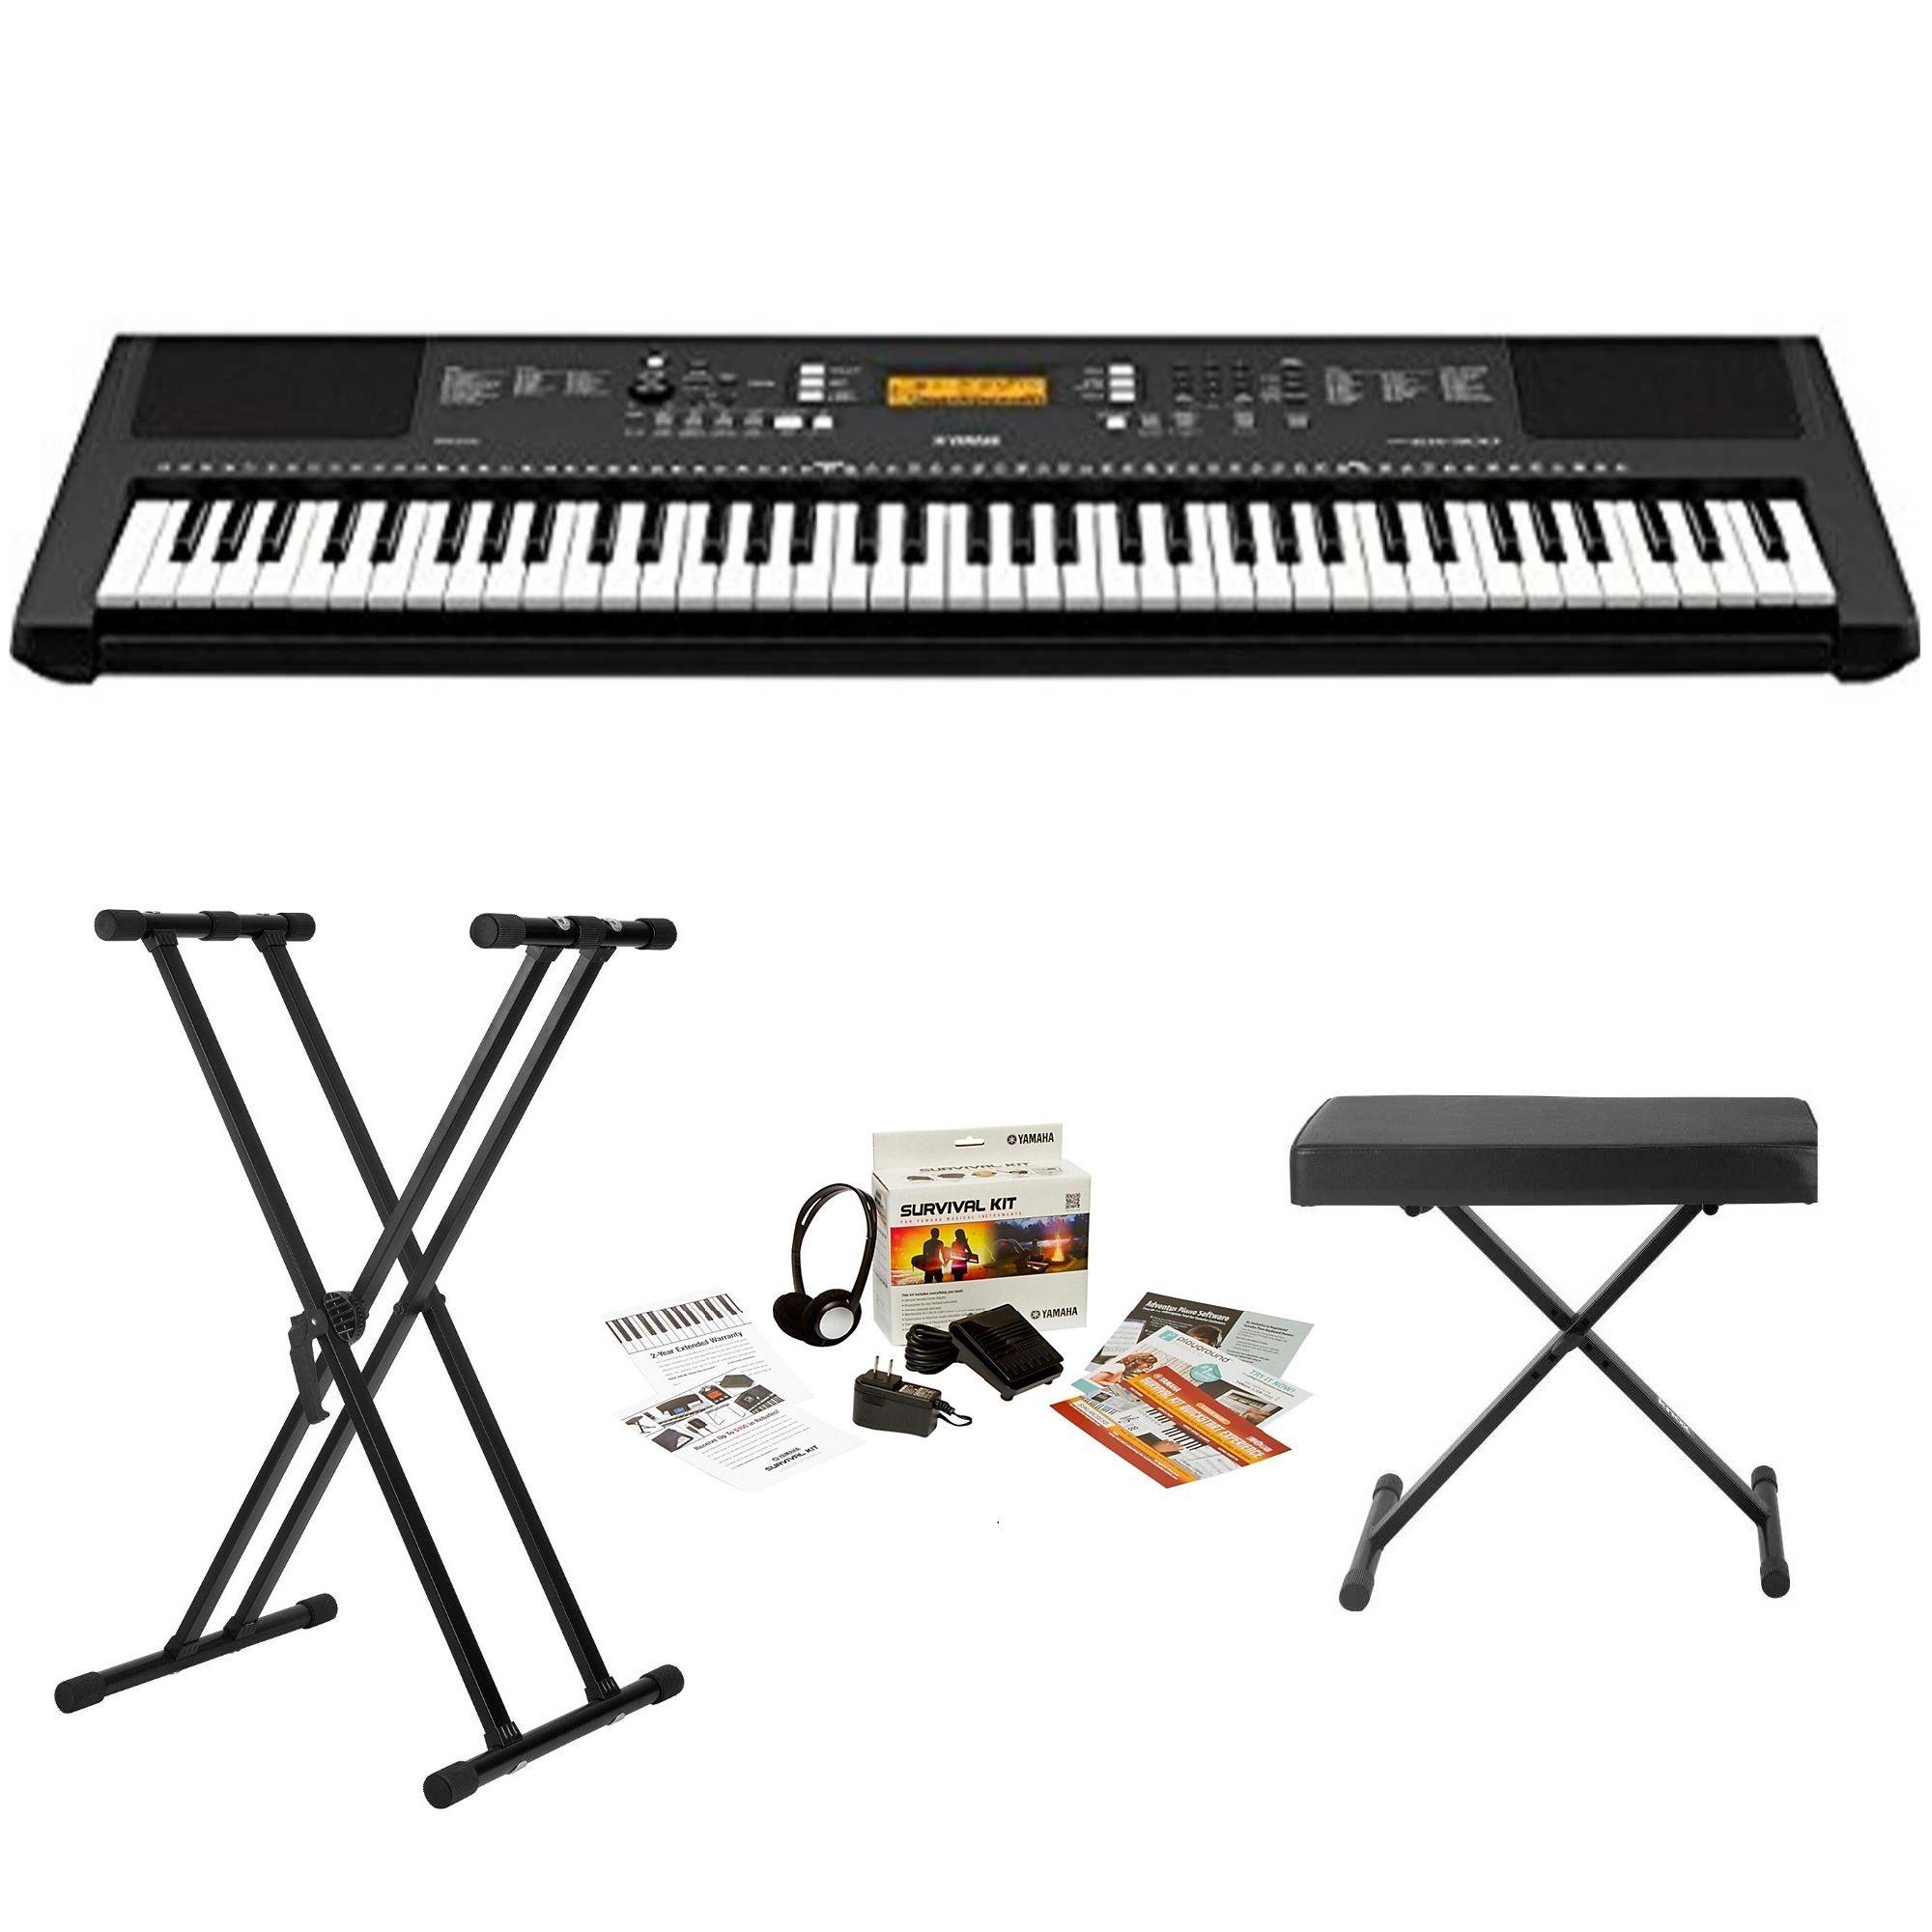 Yamaha PSREW300 76-key Portable Keyboard With Knox Stand Knox Bench and Yamaha Power Supply